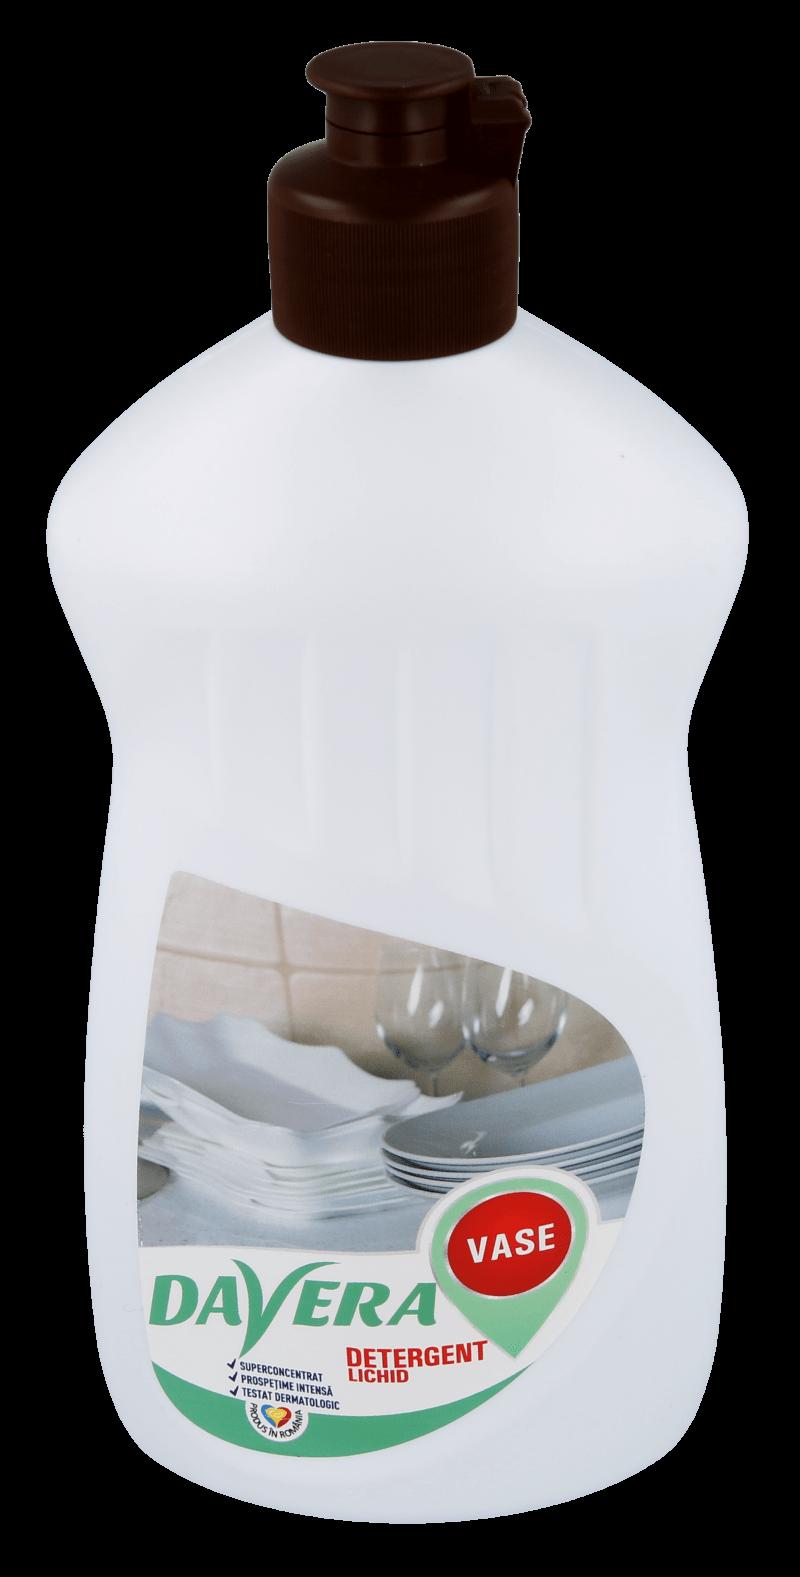 Vase mai curate cu detergenții de vase Klintensiv Davera